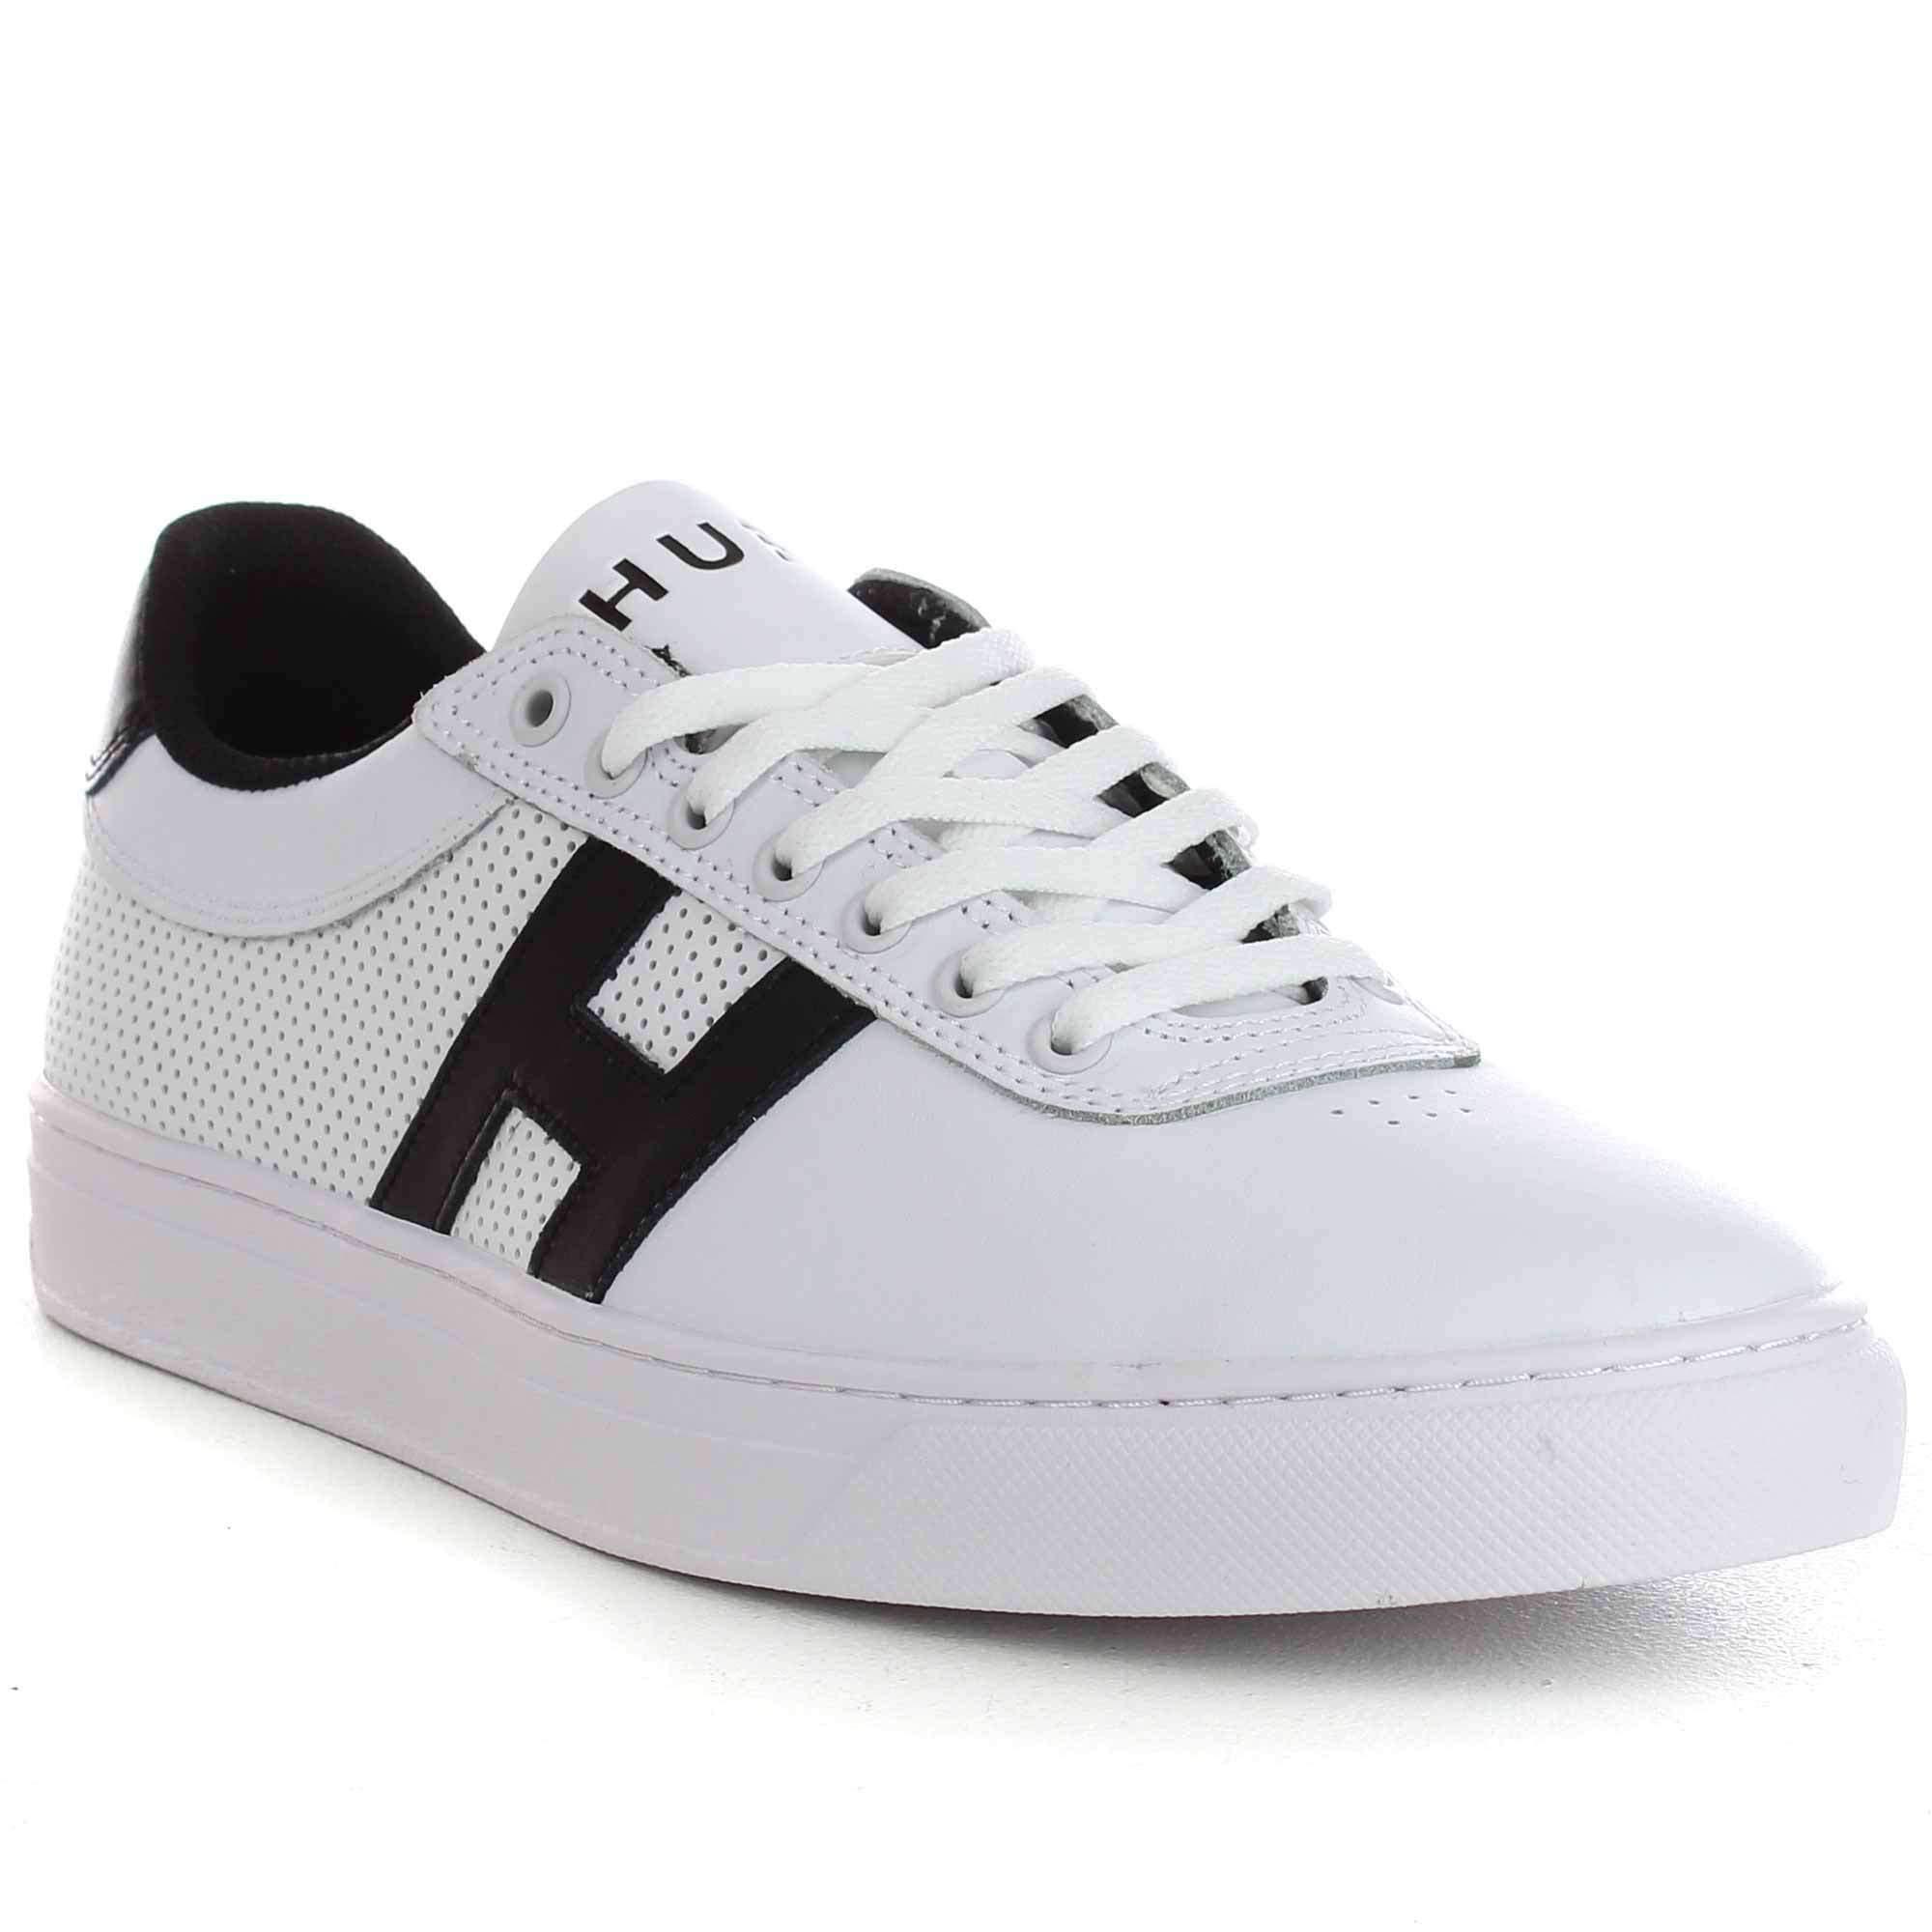 HUF Soto Shoes in White Black Black | Shoes, Huf, Mens skate